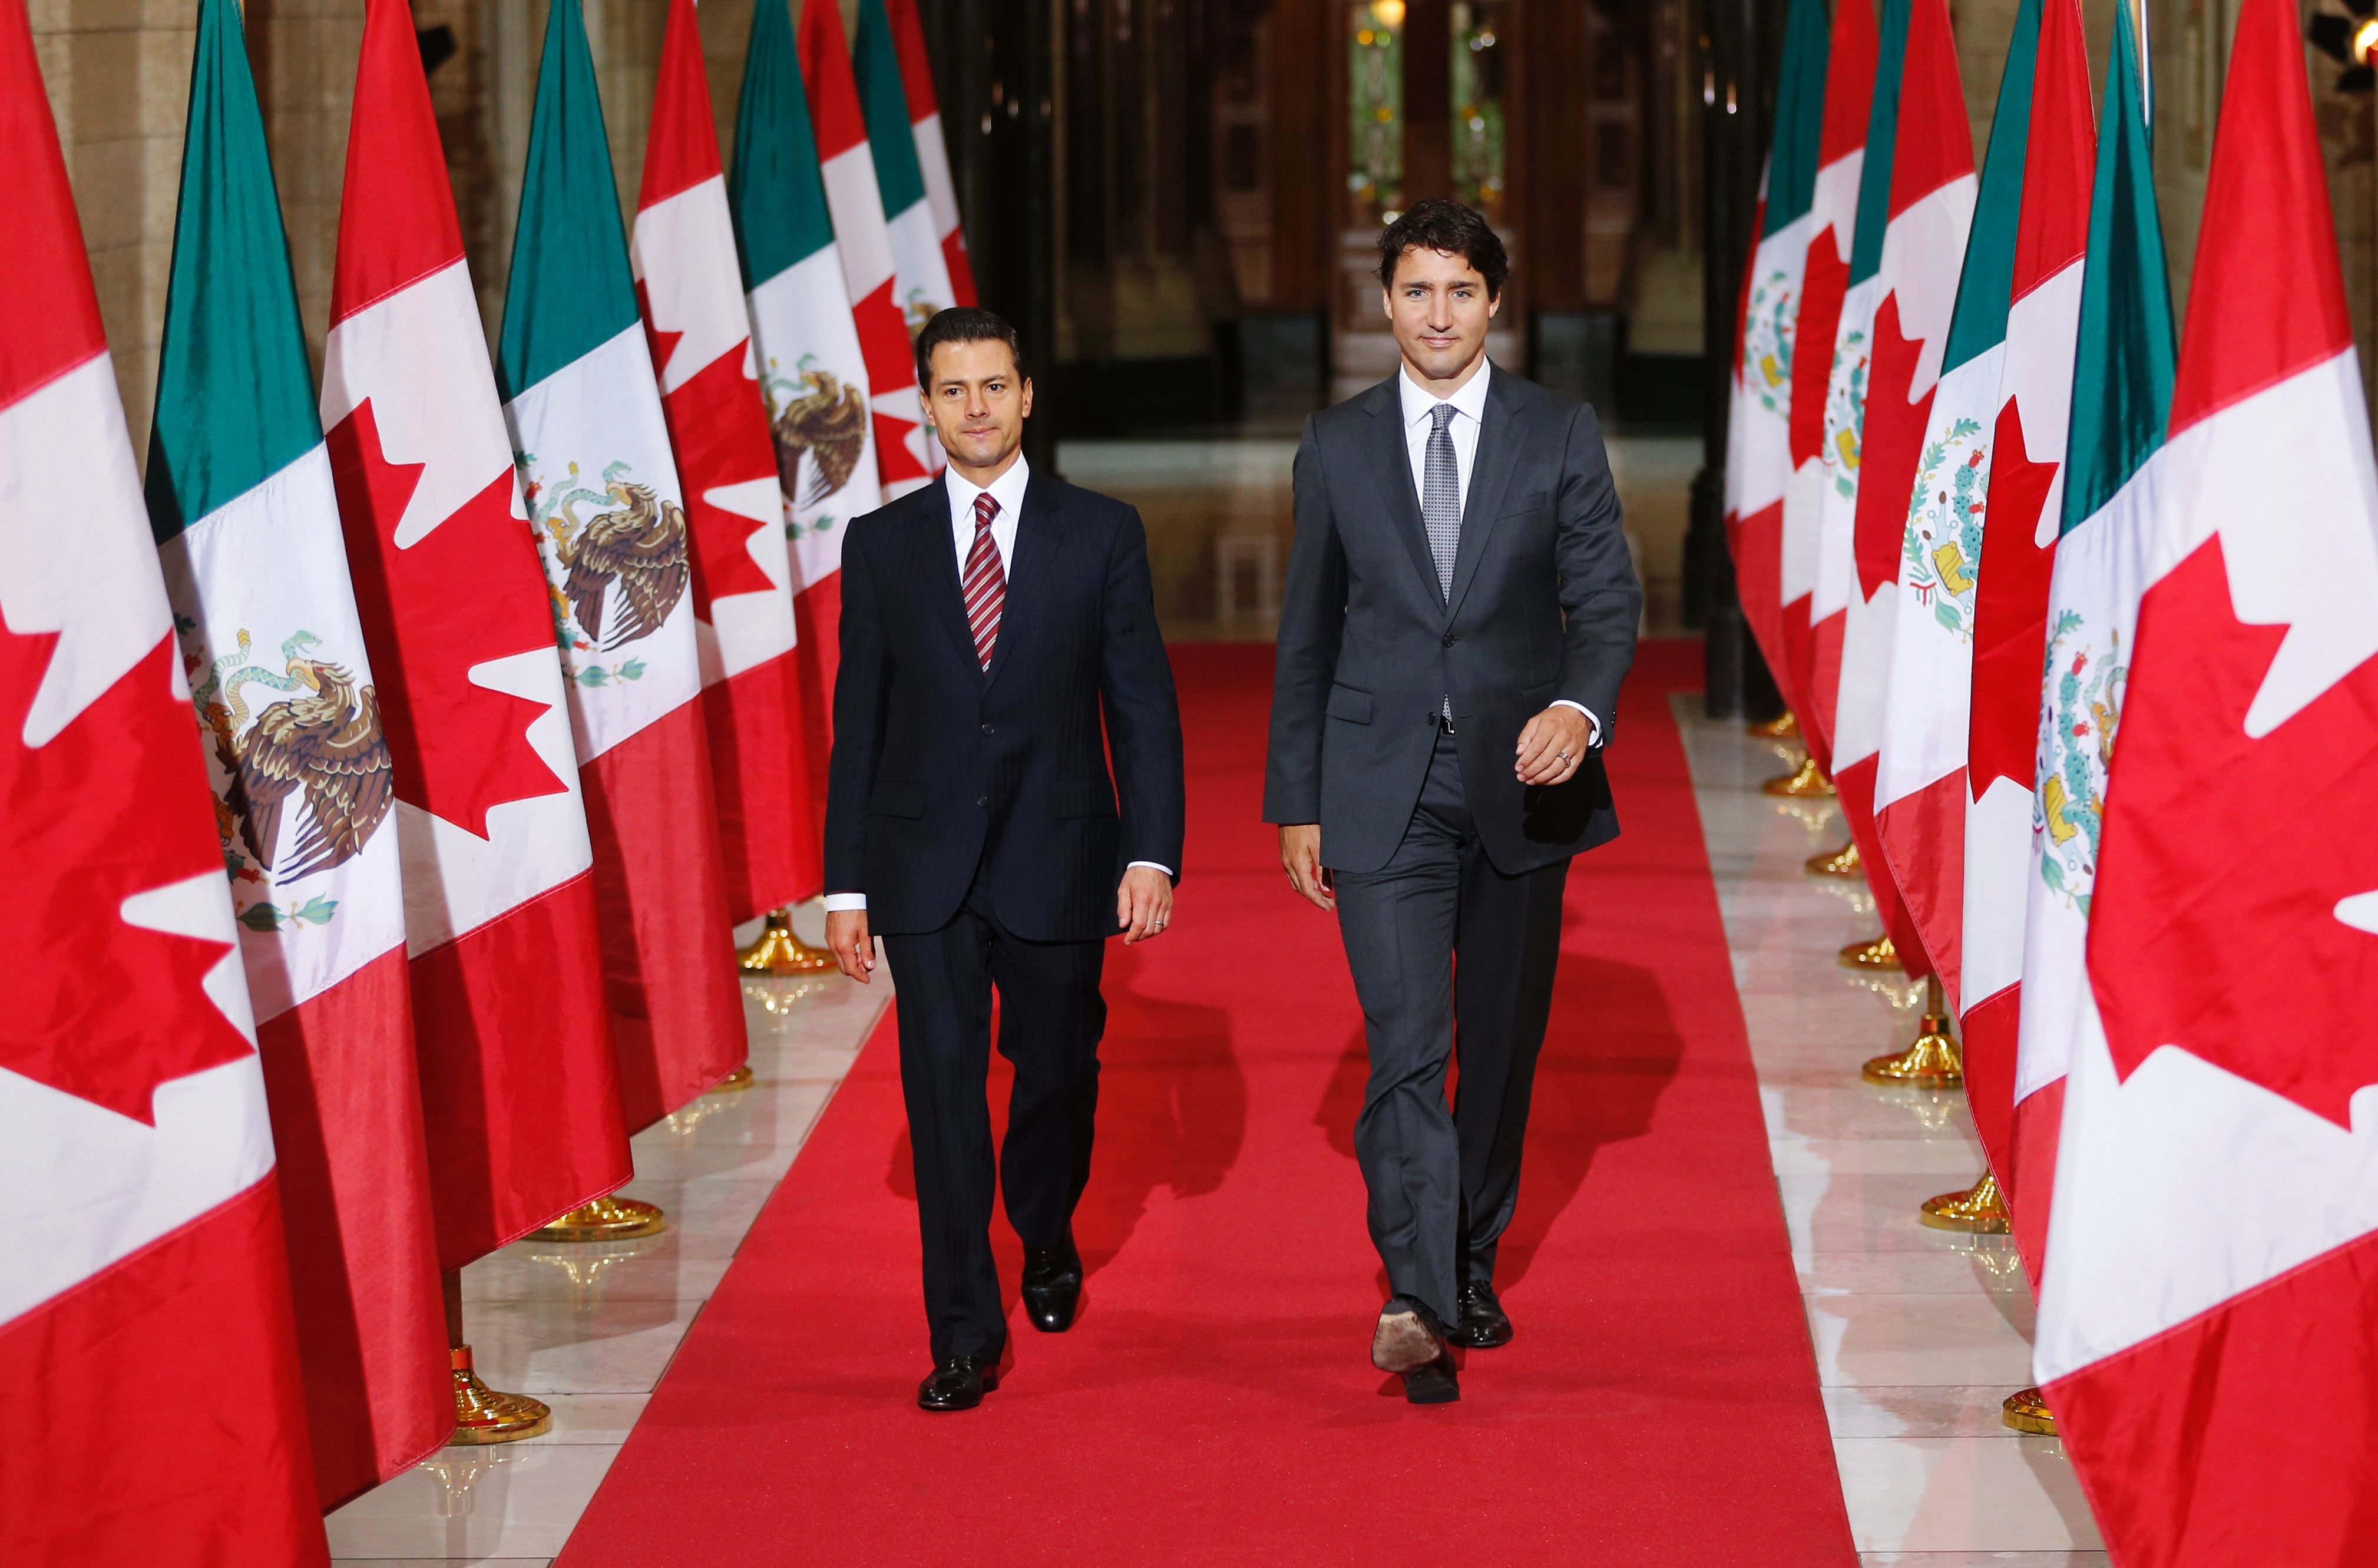 CANADA-US-MEXICO-SUMMIT-DIPLOMACY